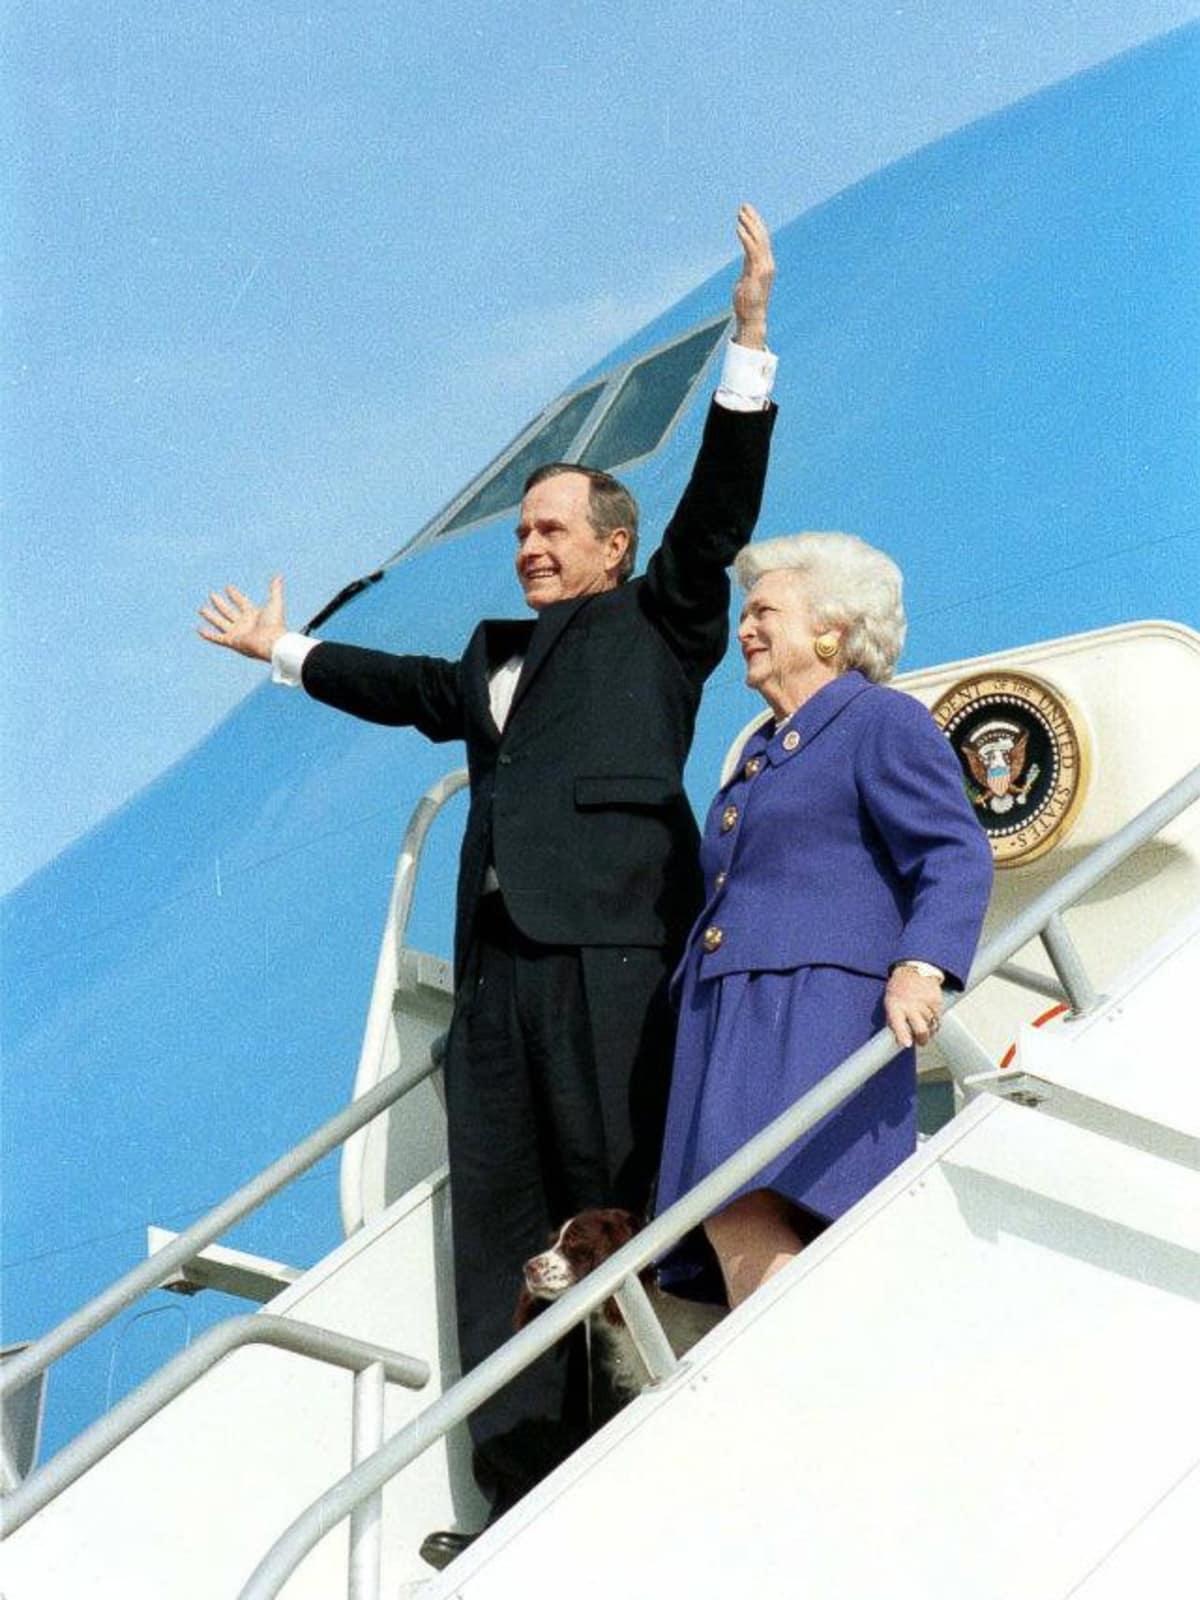 George H.W. Bush, Barbara Bush, arrive in Houston after inaugural ceremony, Jan. 20, 1993